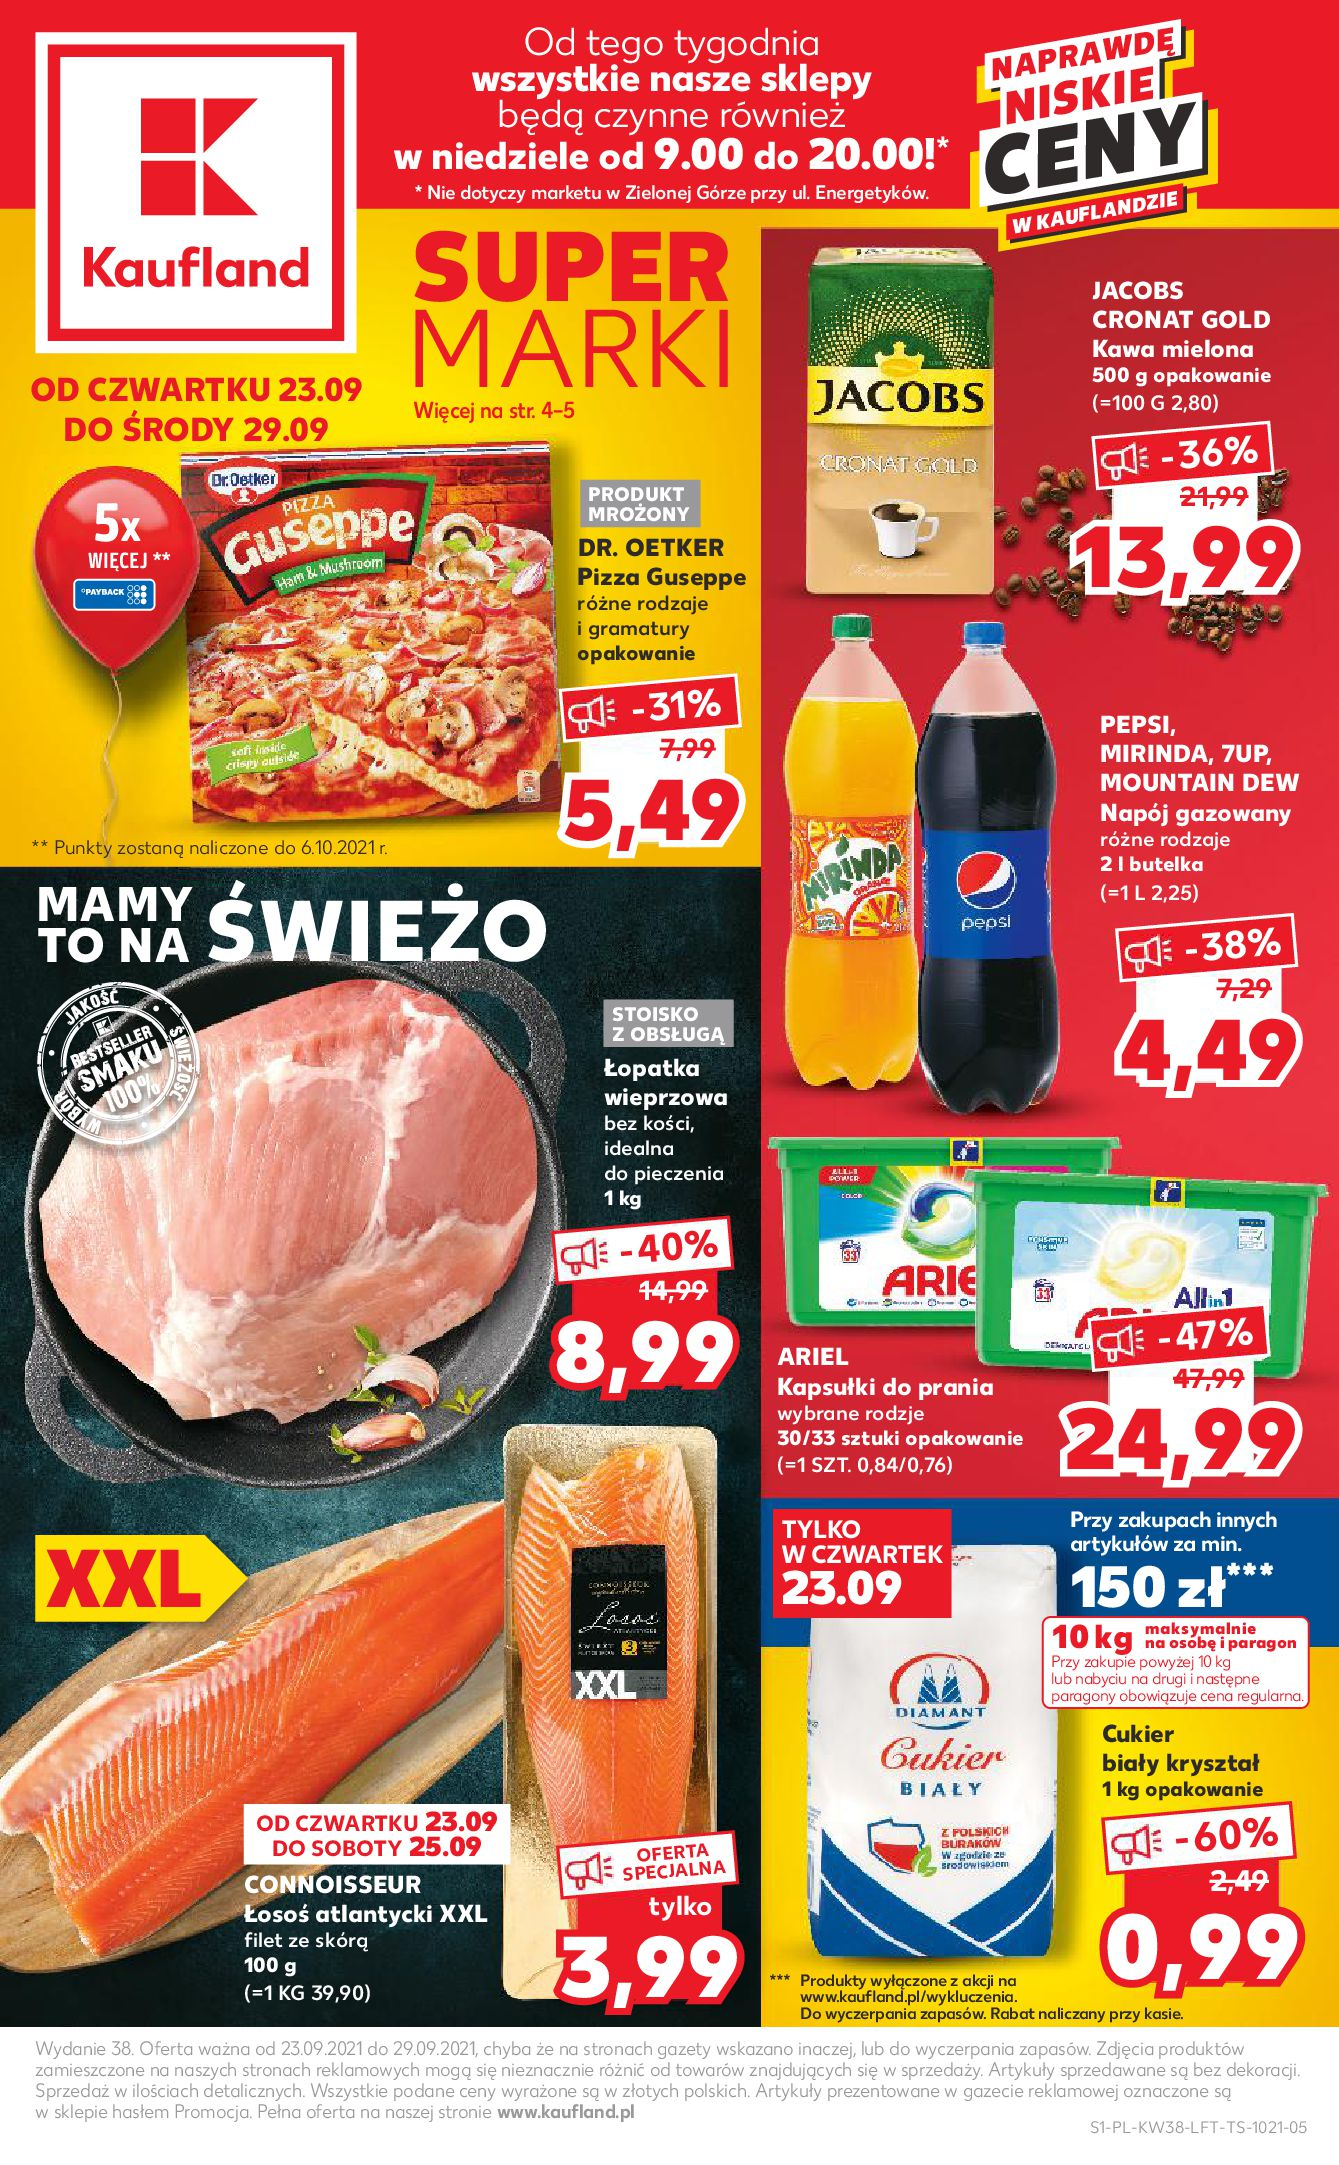 Gazetka Kaufland: Gazetka Kaufland 23-29.09. - 22.09.2021